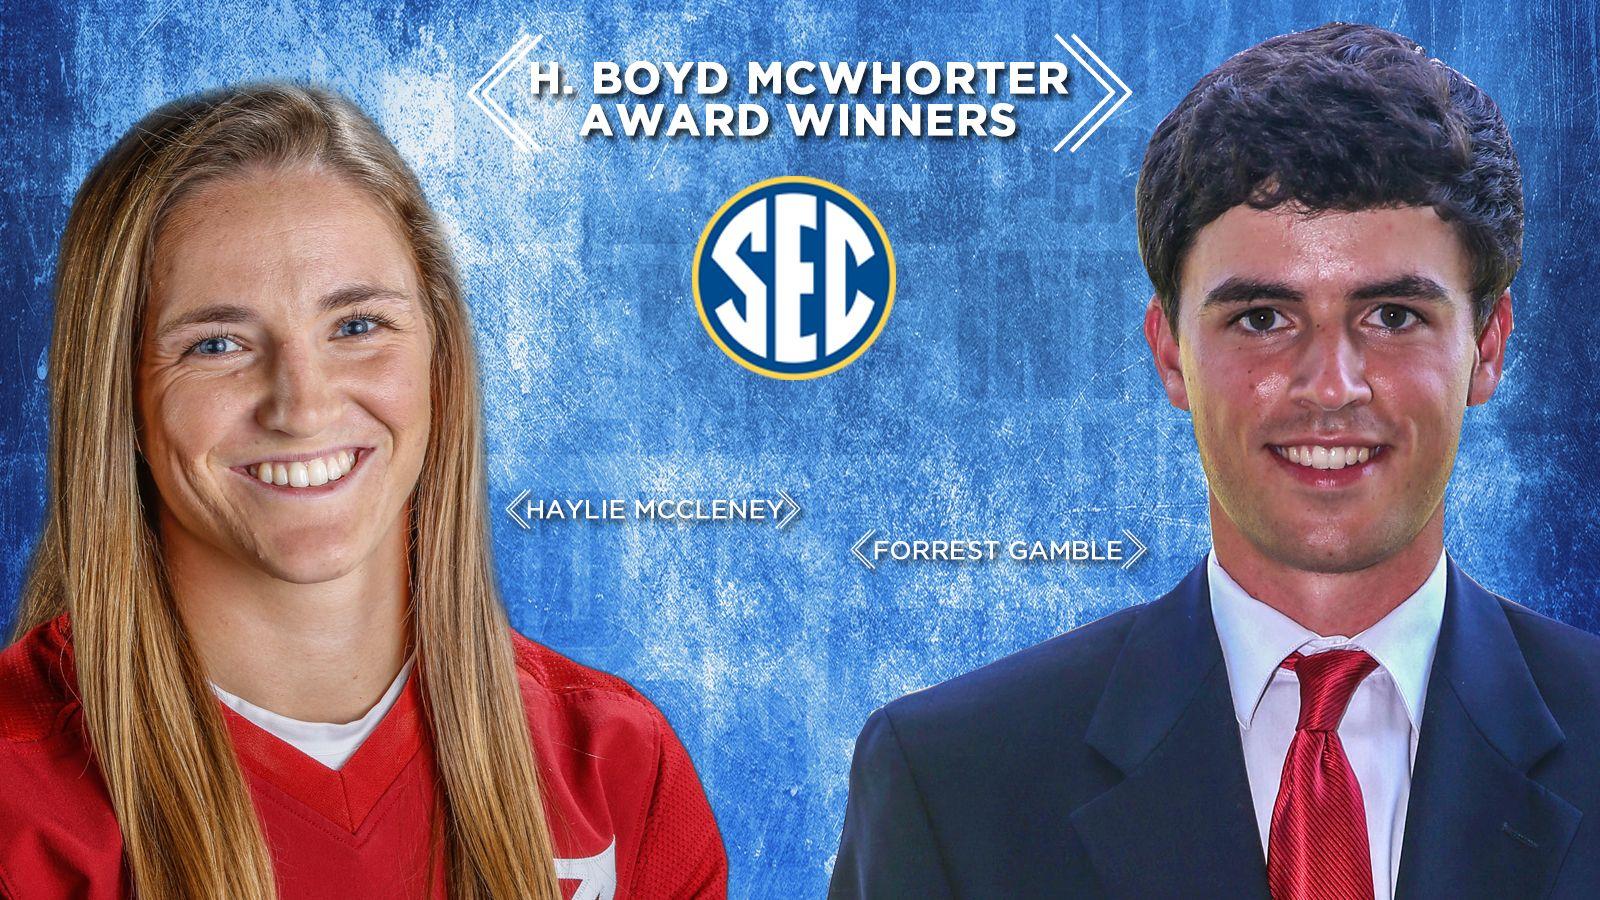 Gamble, McCleney win McWhorter Award